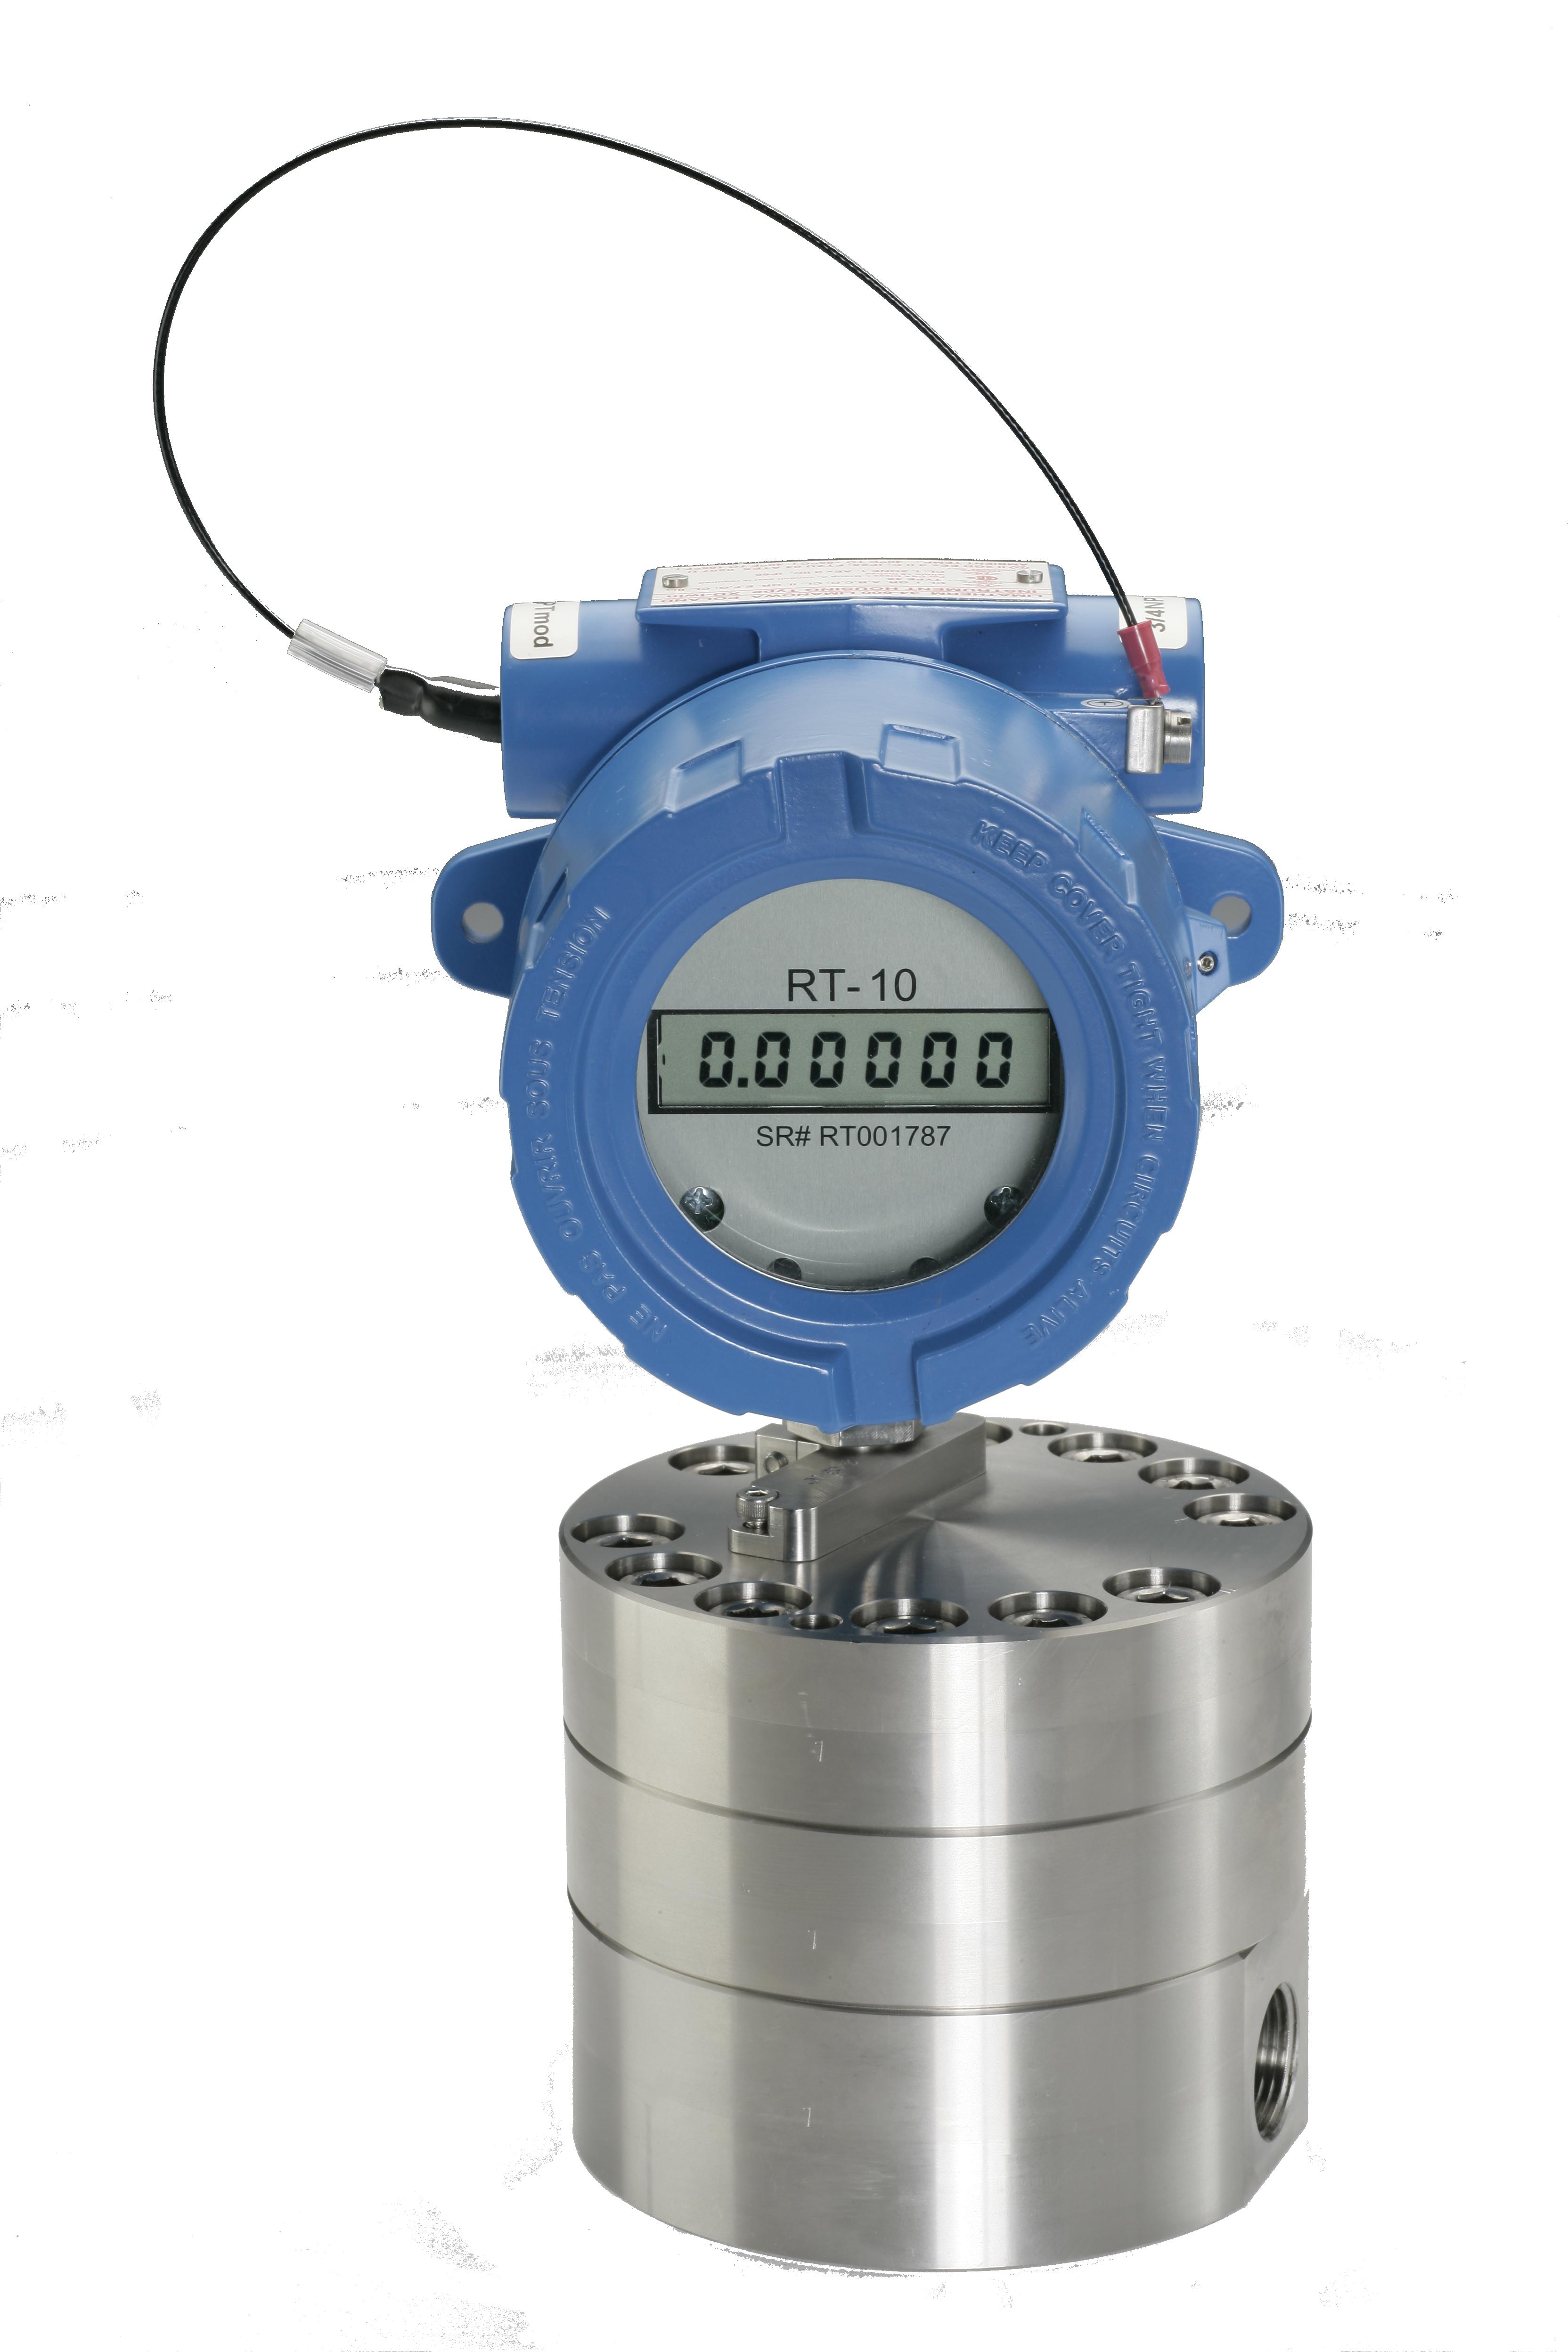 RT-10 Battery-Powered Flow Transmitter